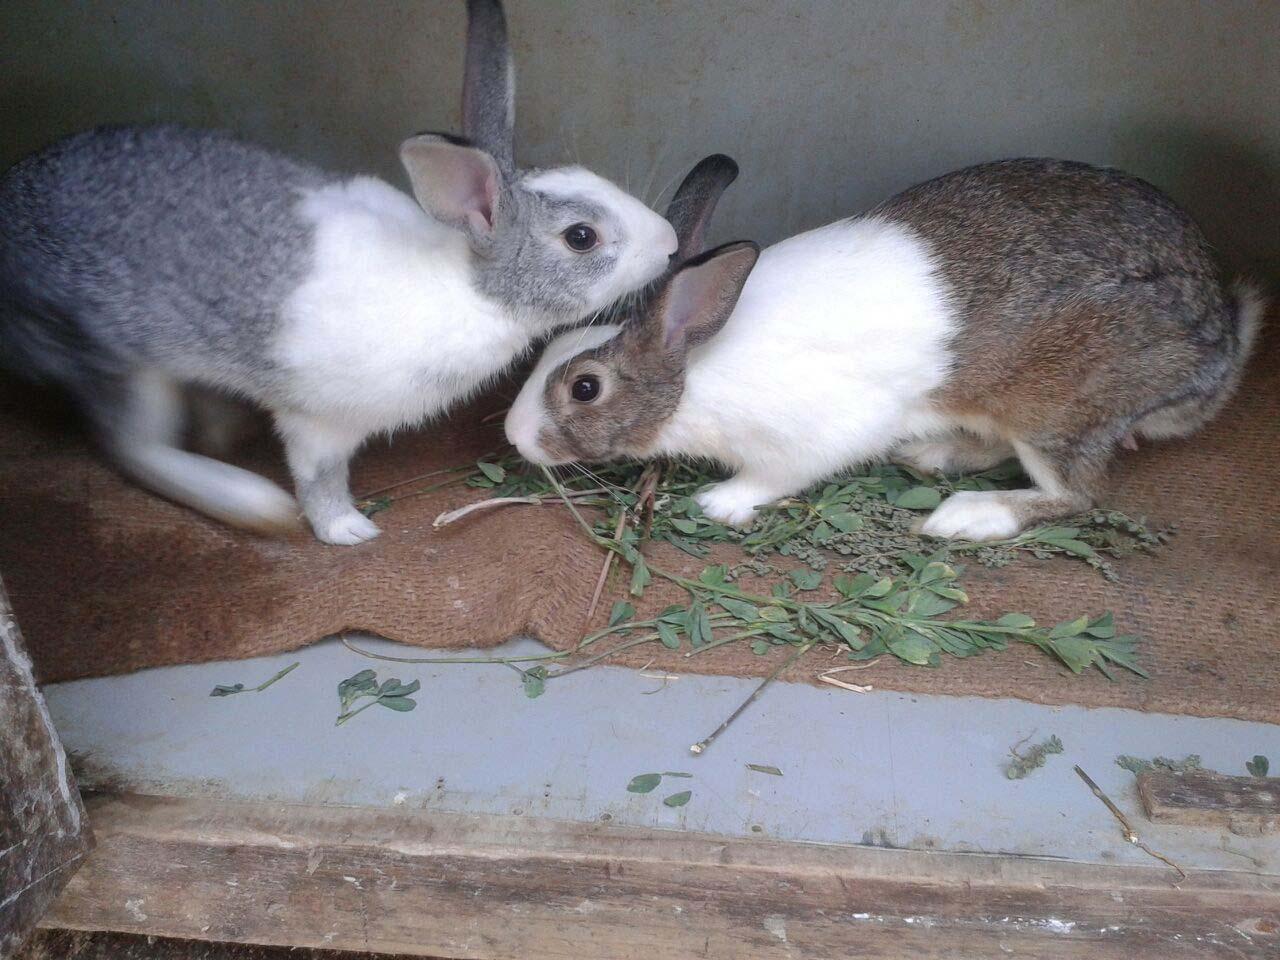 Cute White Rabbit Wallpapers For Desktop Lovely Cute Awesome Rabbit Images Love Images Of Love